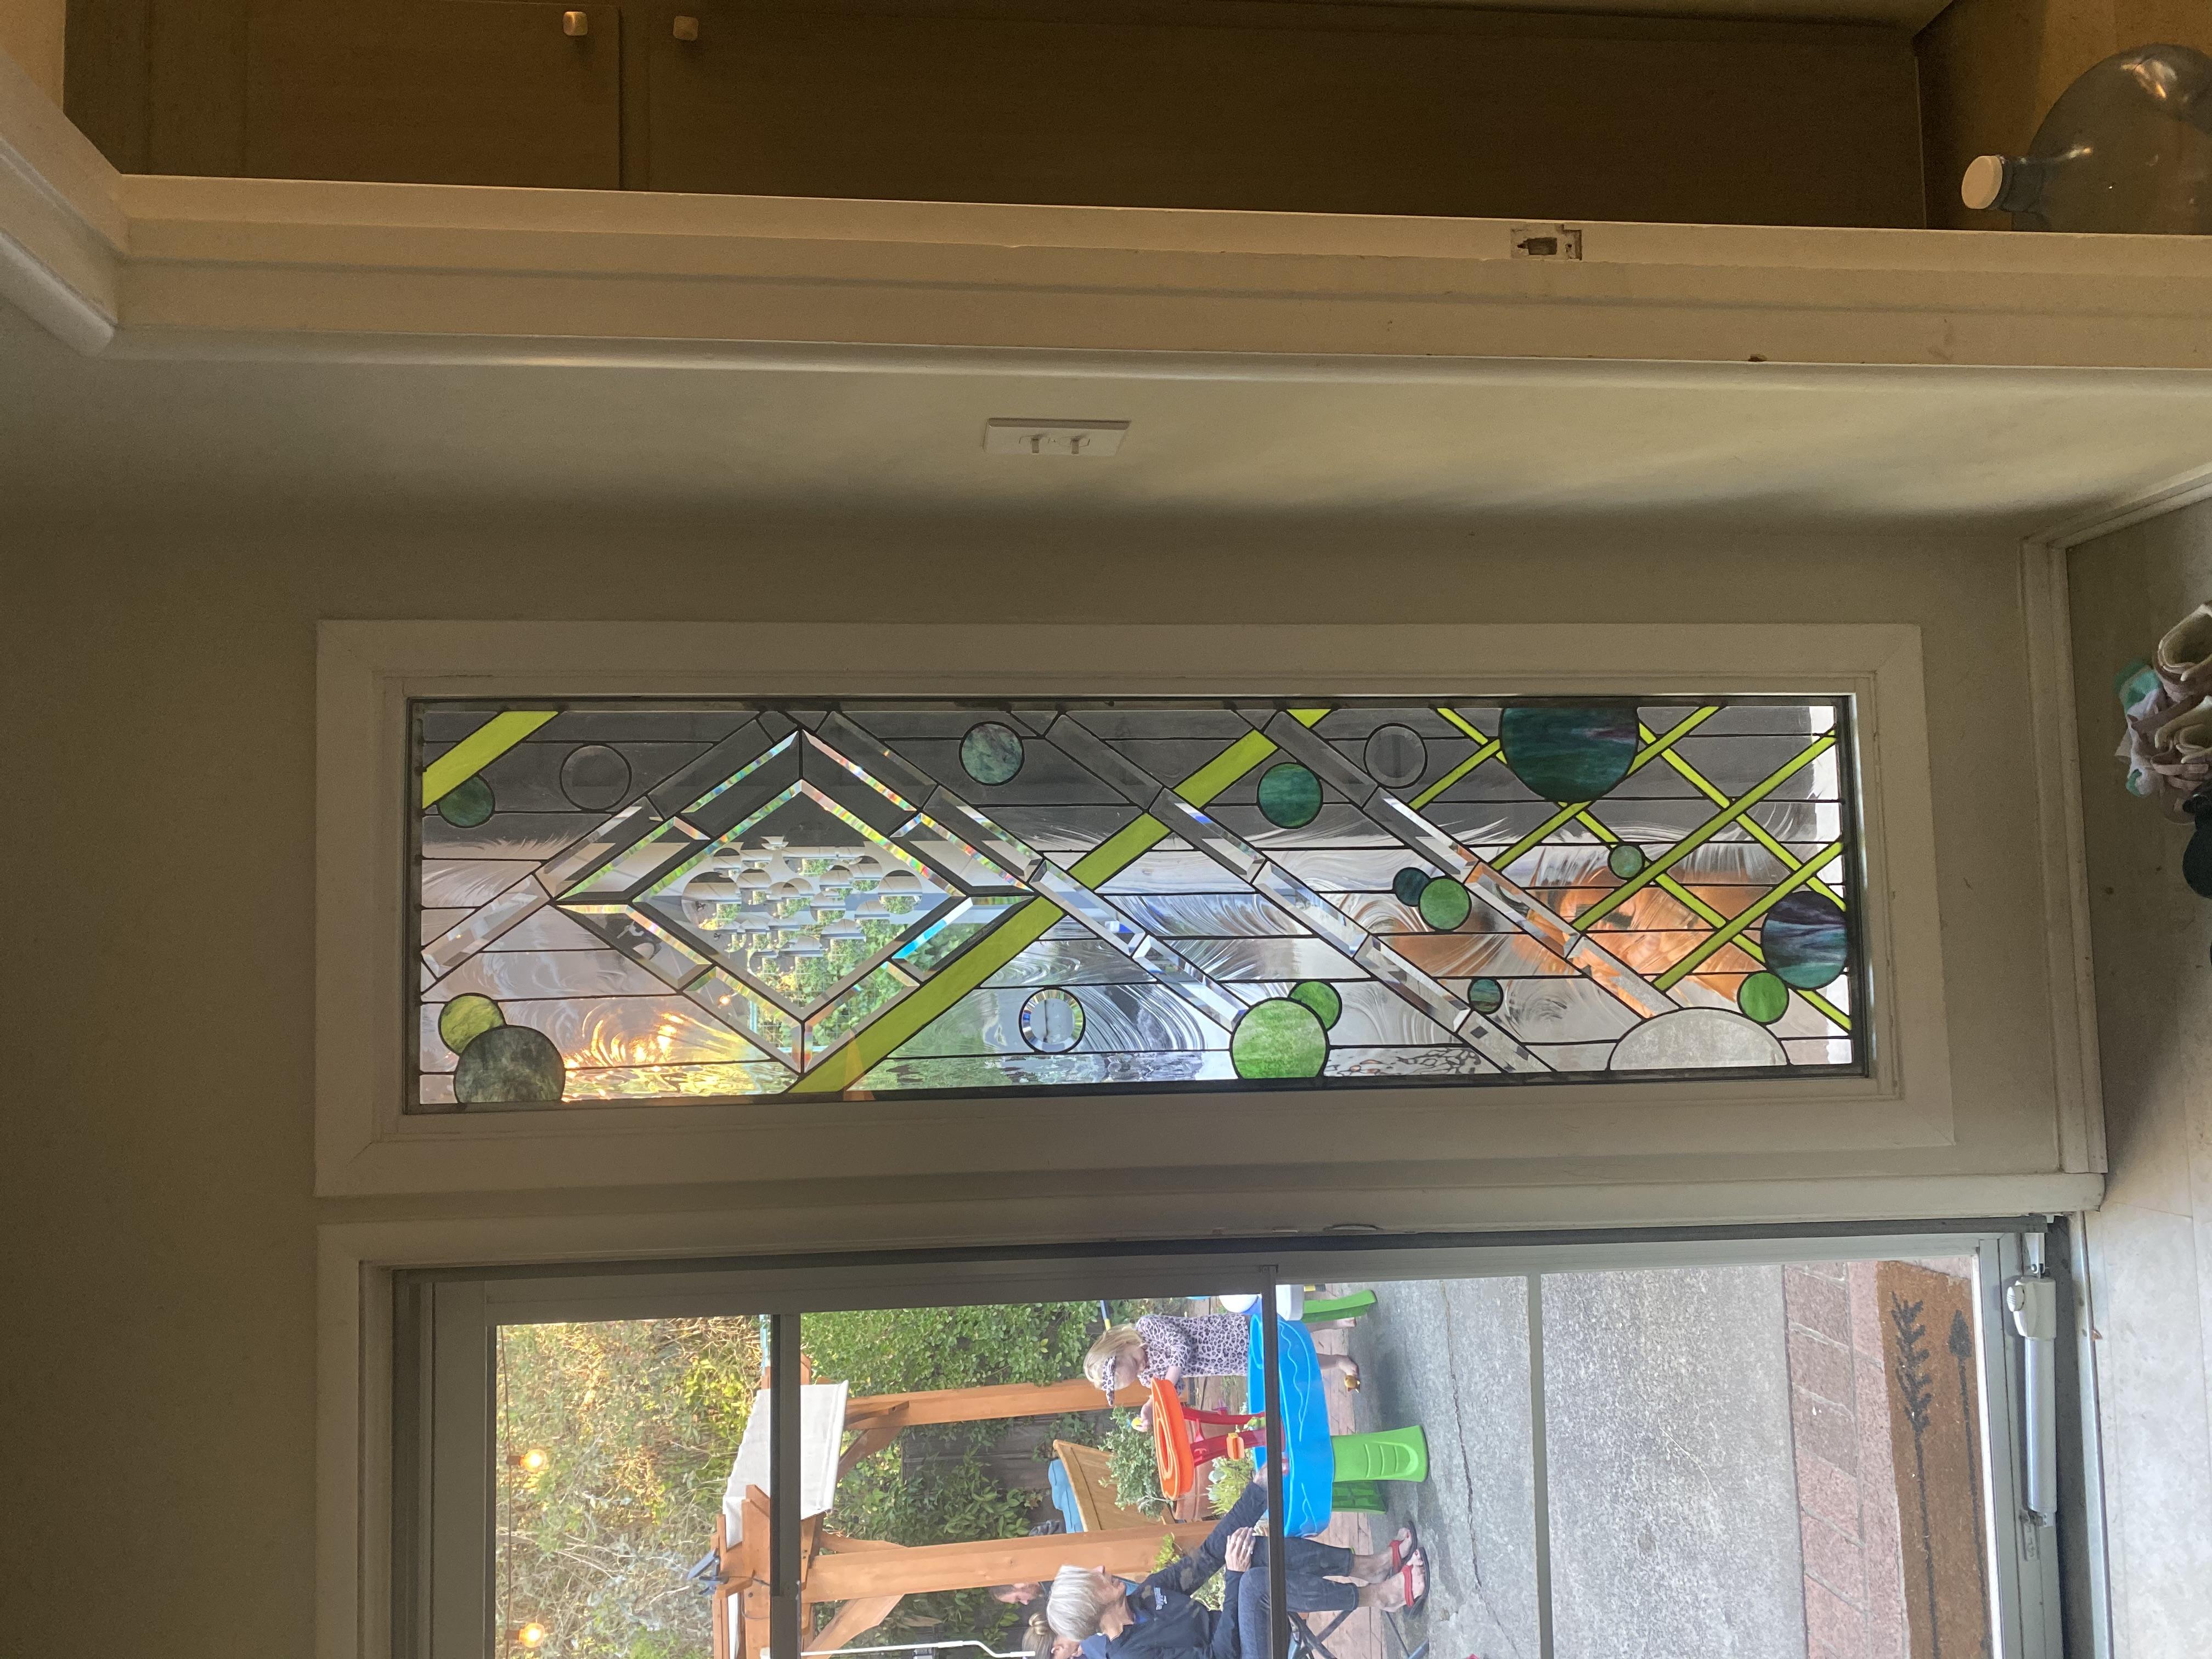 Sausalito reflections (full view)